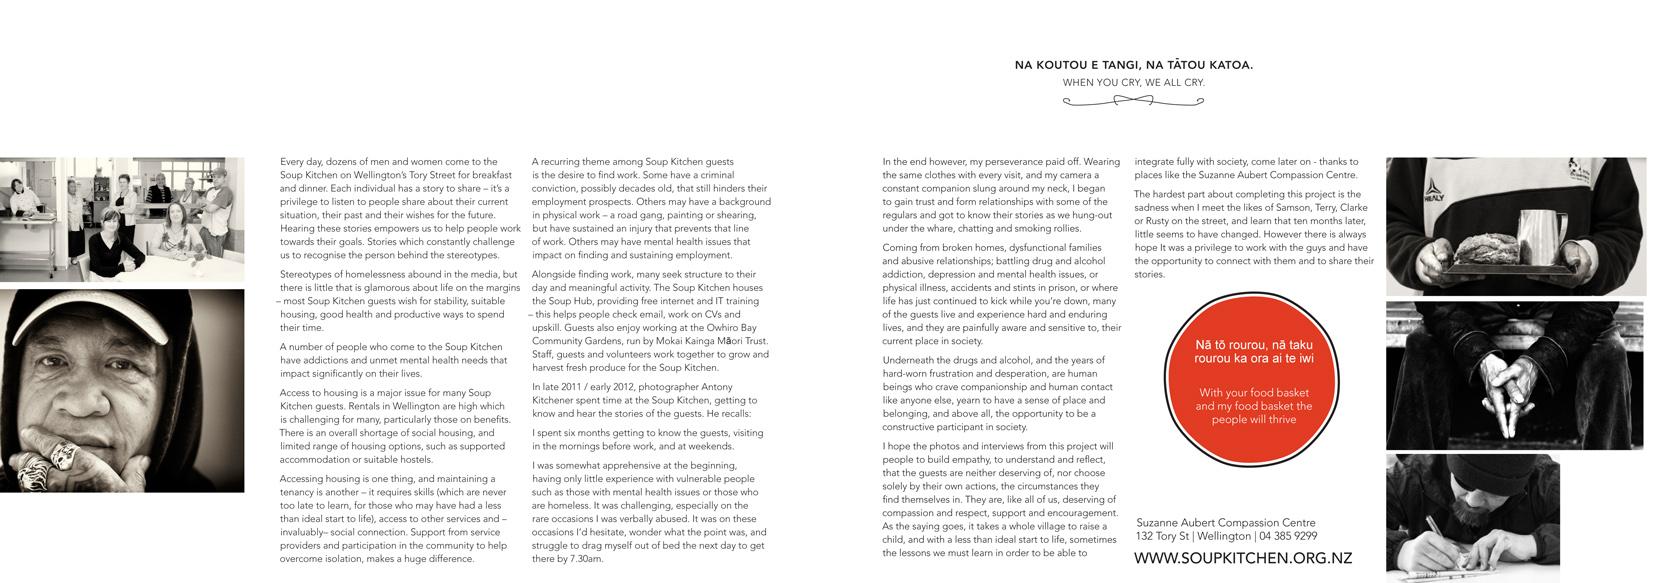 Article on Wellington's Soup Kitchen, By Antony Kitchener (Kiwi Diary 2013)